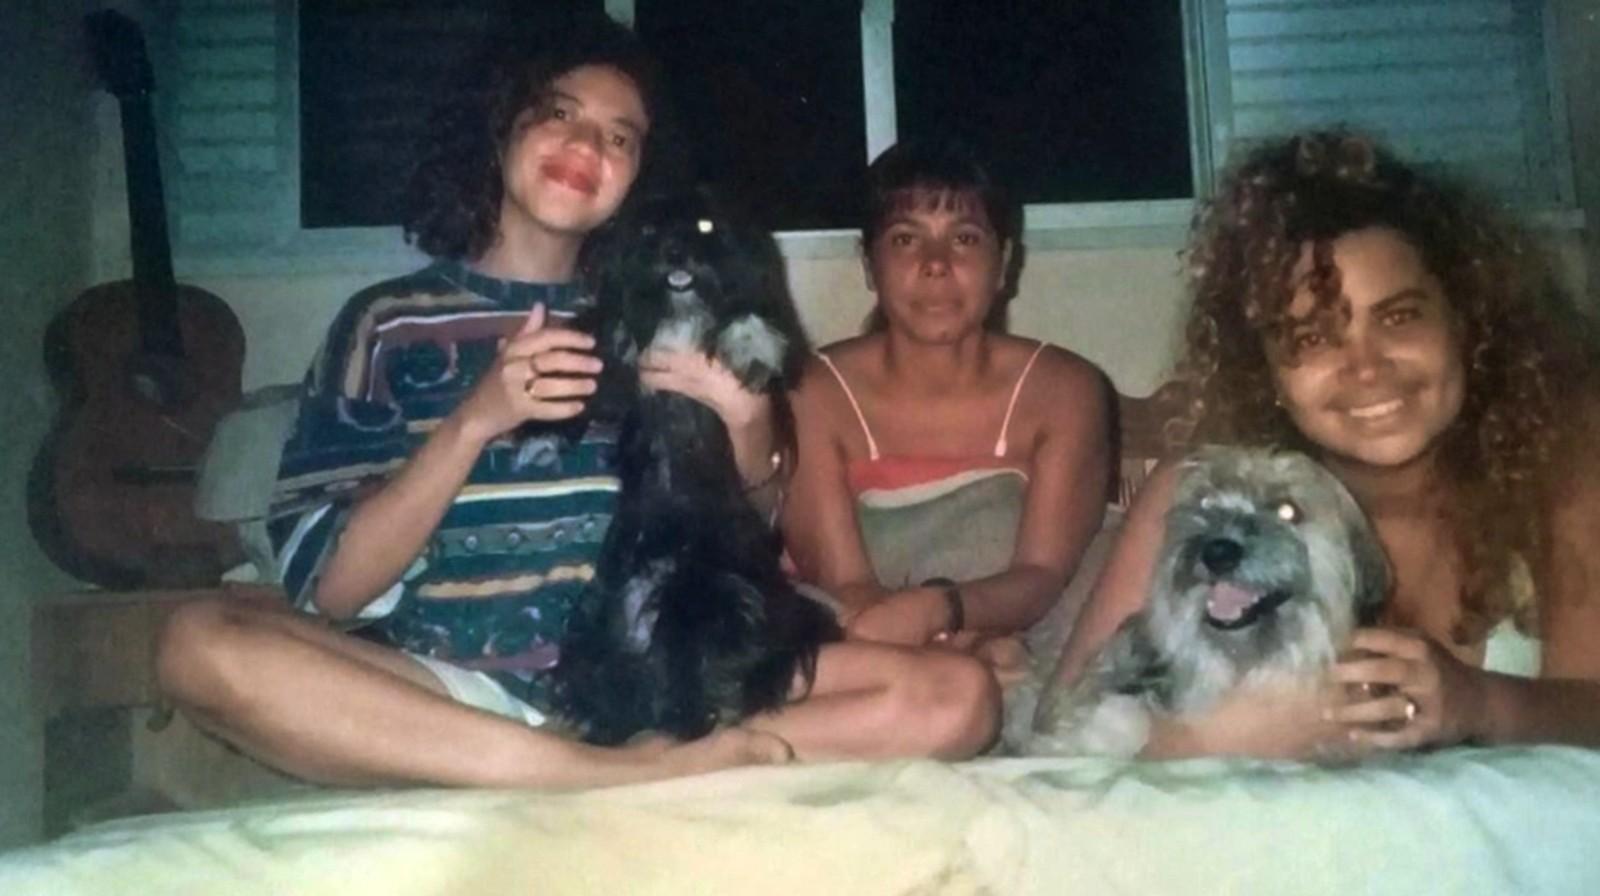 Amigas de Solange Almeida mostraram fotos de antigamente